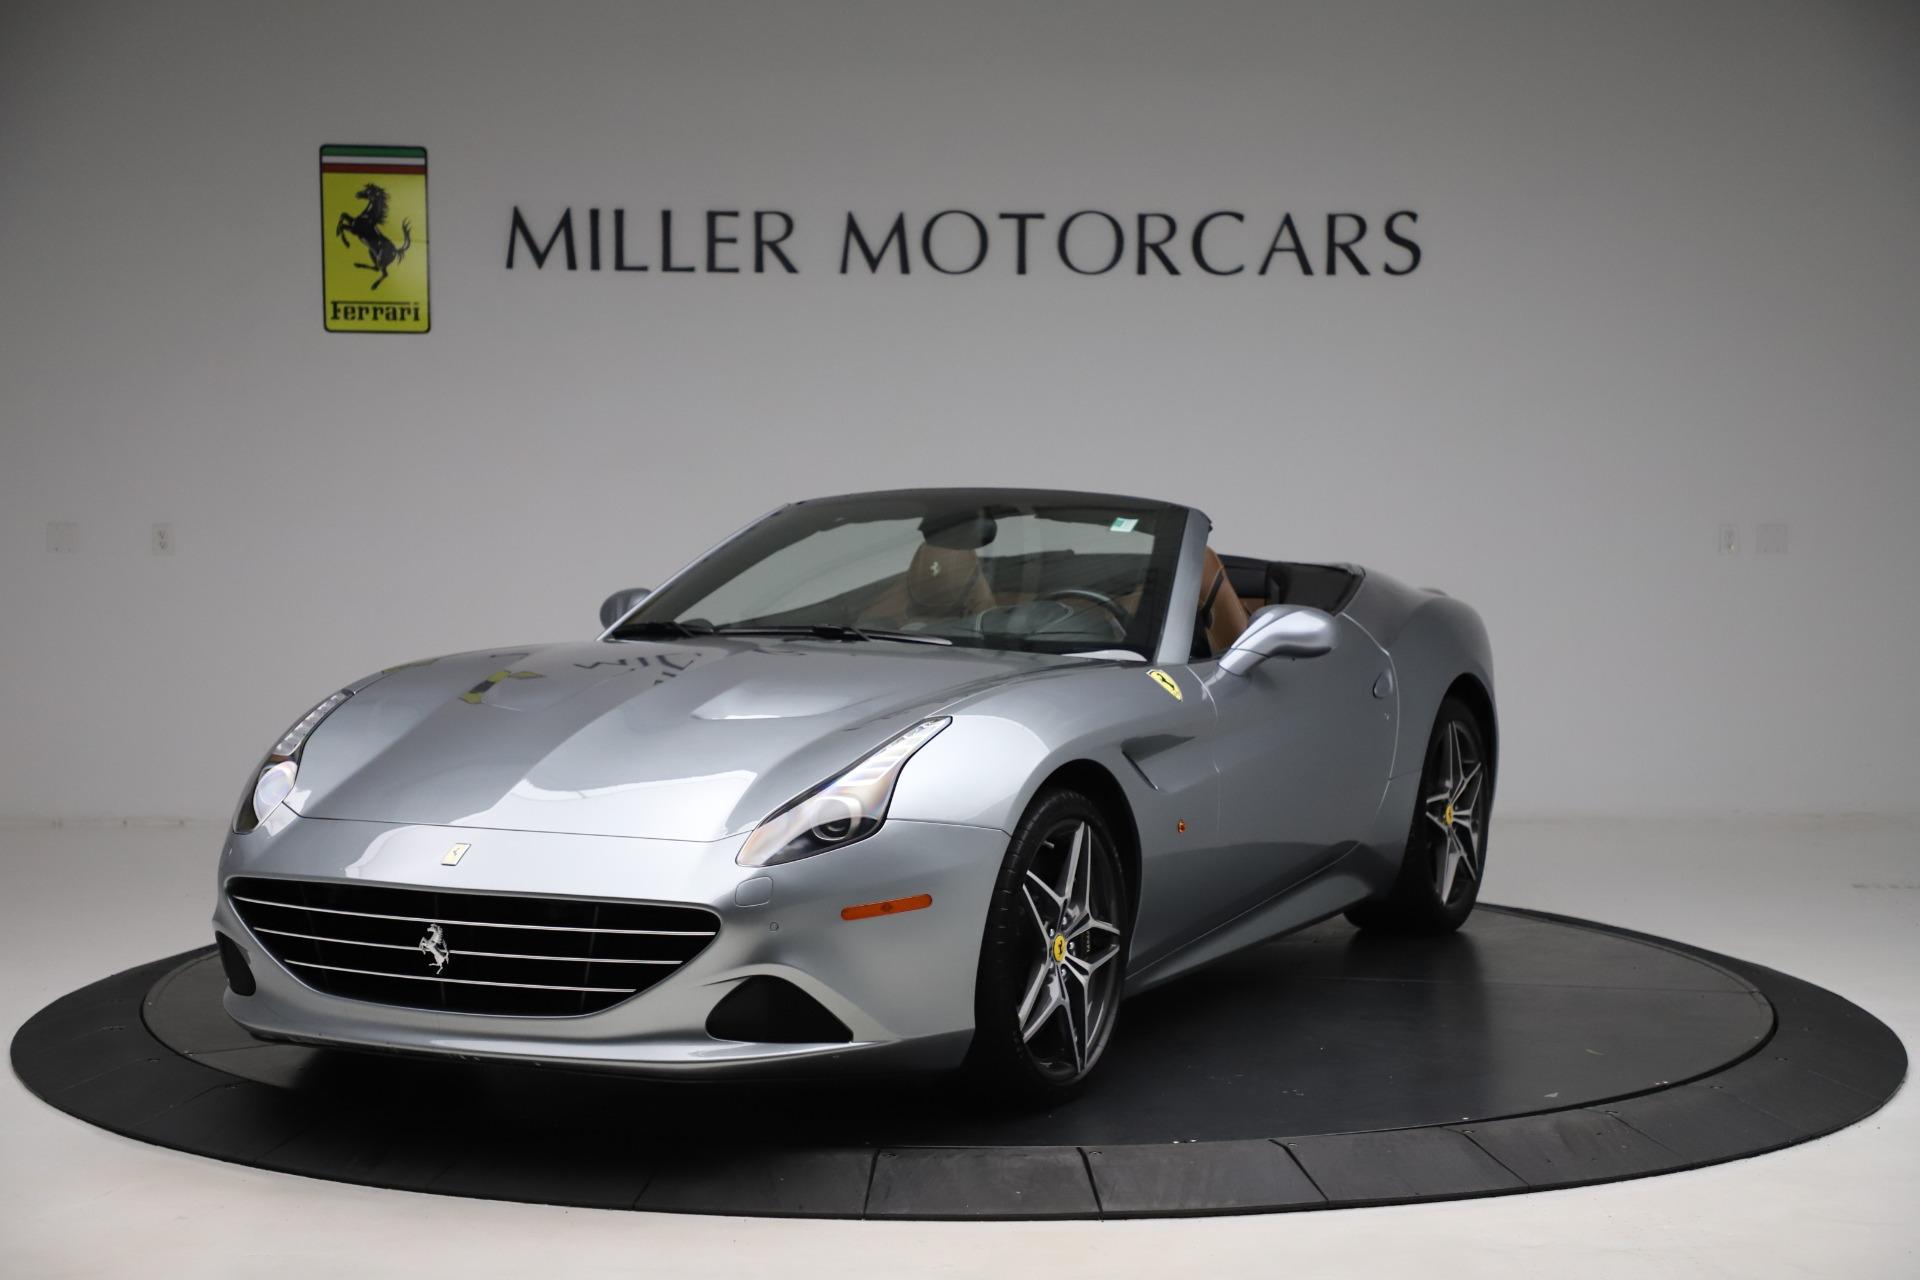 Used 2016 Ferrari California T for sale $142,900 at Aston Martin of Greenwich in Greenwich CT 06830 1